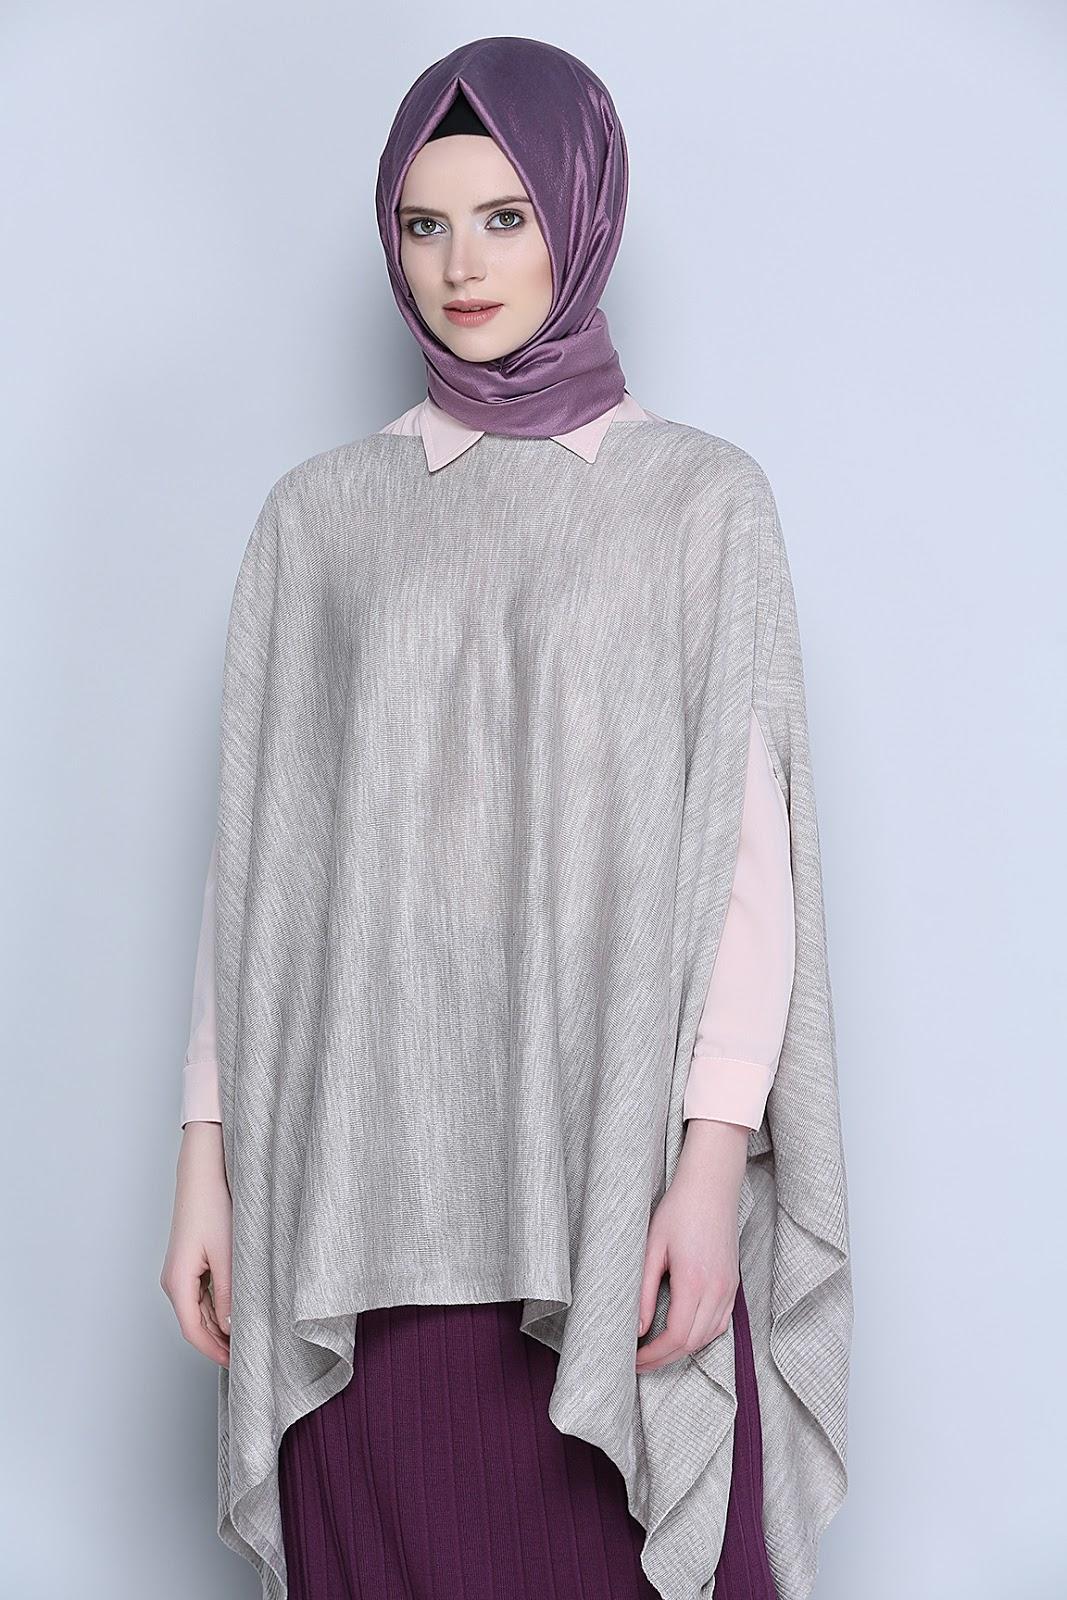 Hijab Fashion Hijab Mode 2018 Hijab Fashion And Chic Style